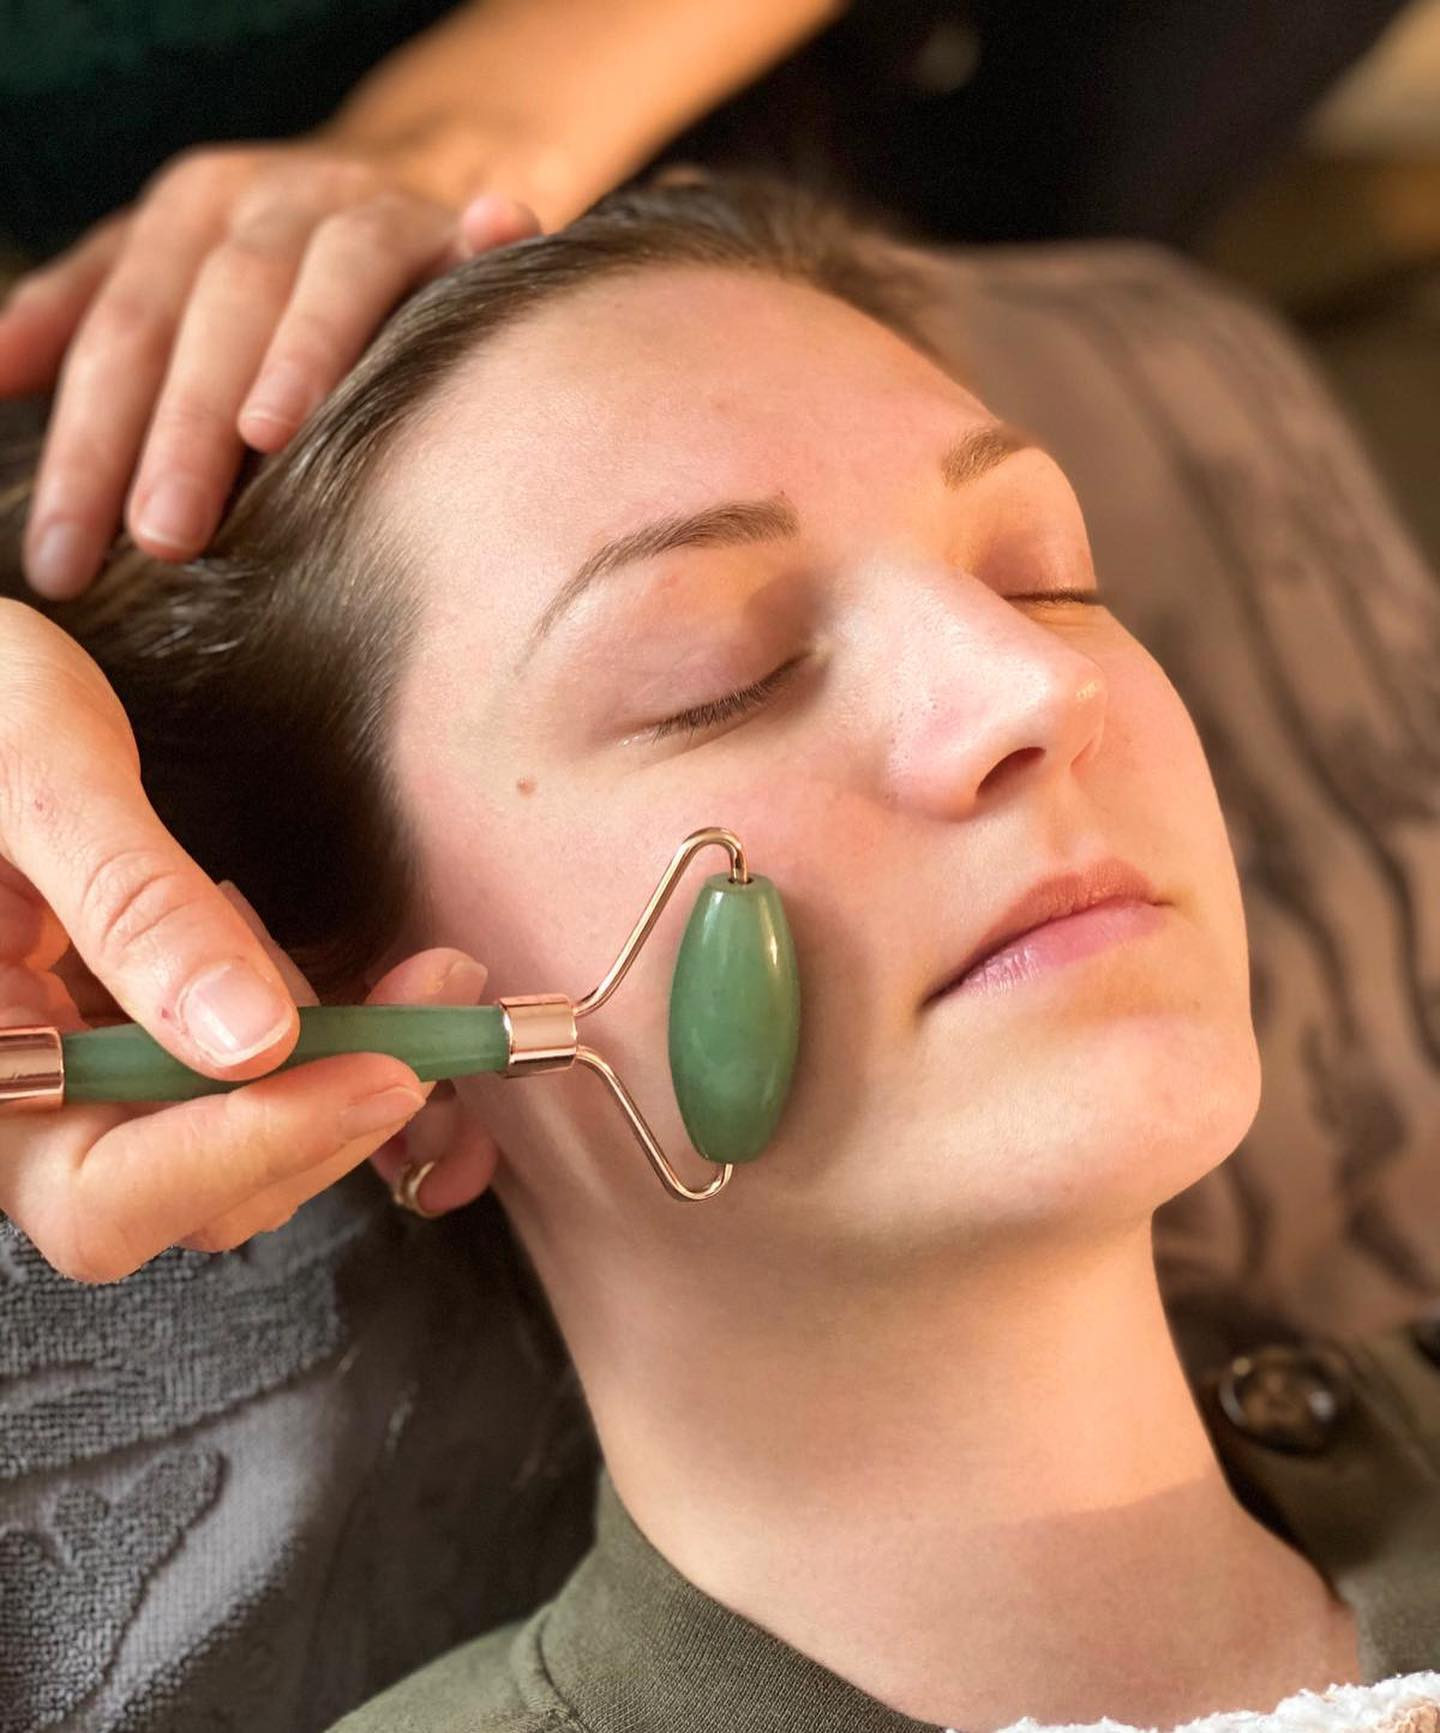 Massage visage aux Pierres de JADE